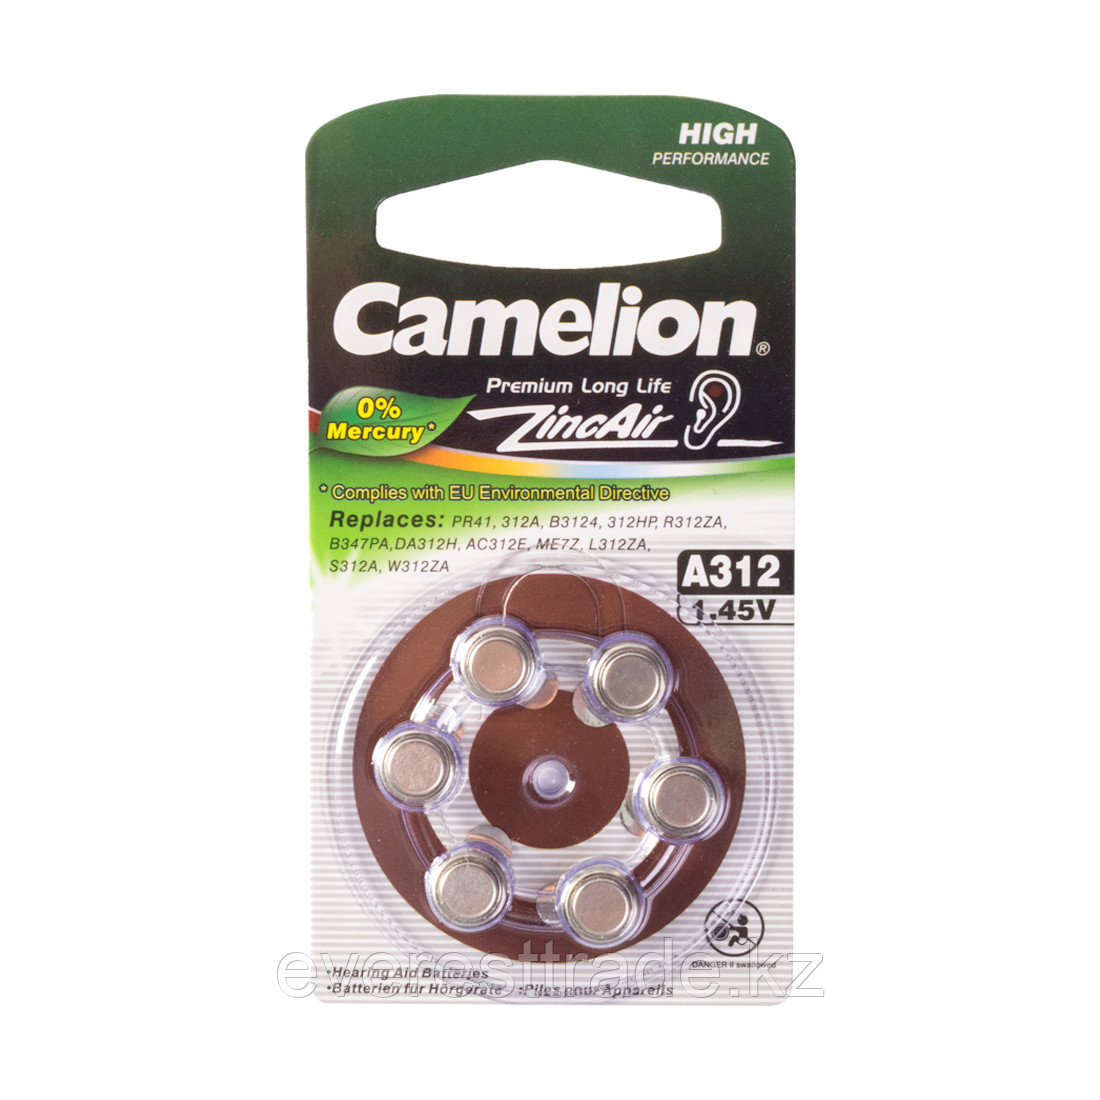 Camelion Батарейки CAMELION A312-BP6  Zinc Air, A312, 1.45V, 0% Ртути, 6 шт., Блистер